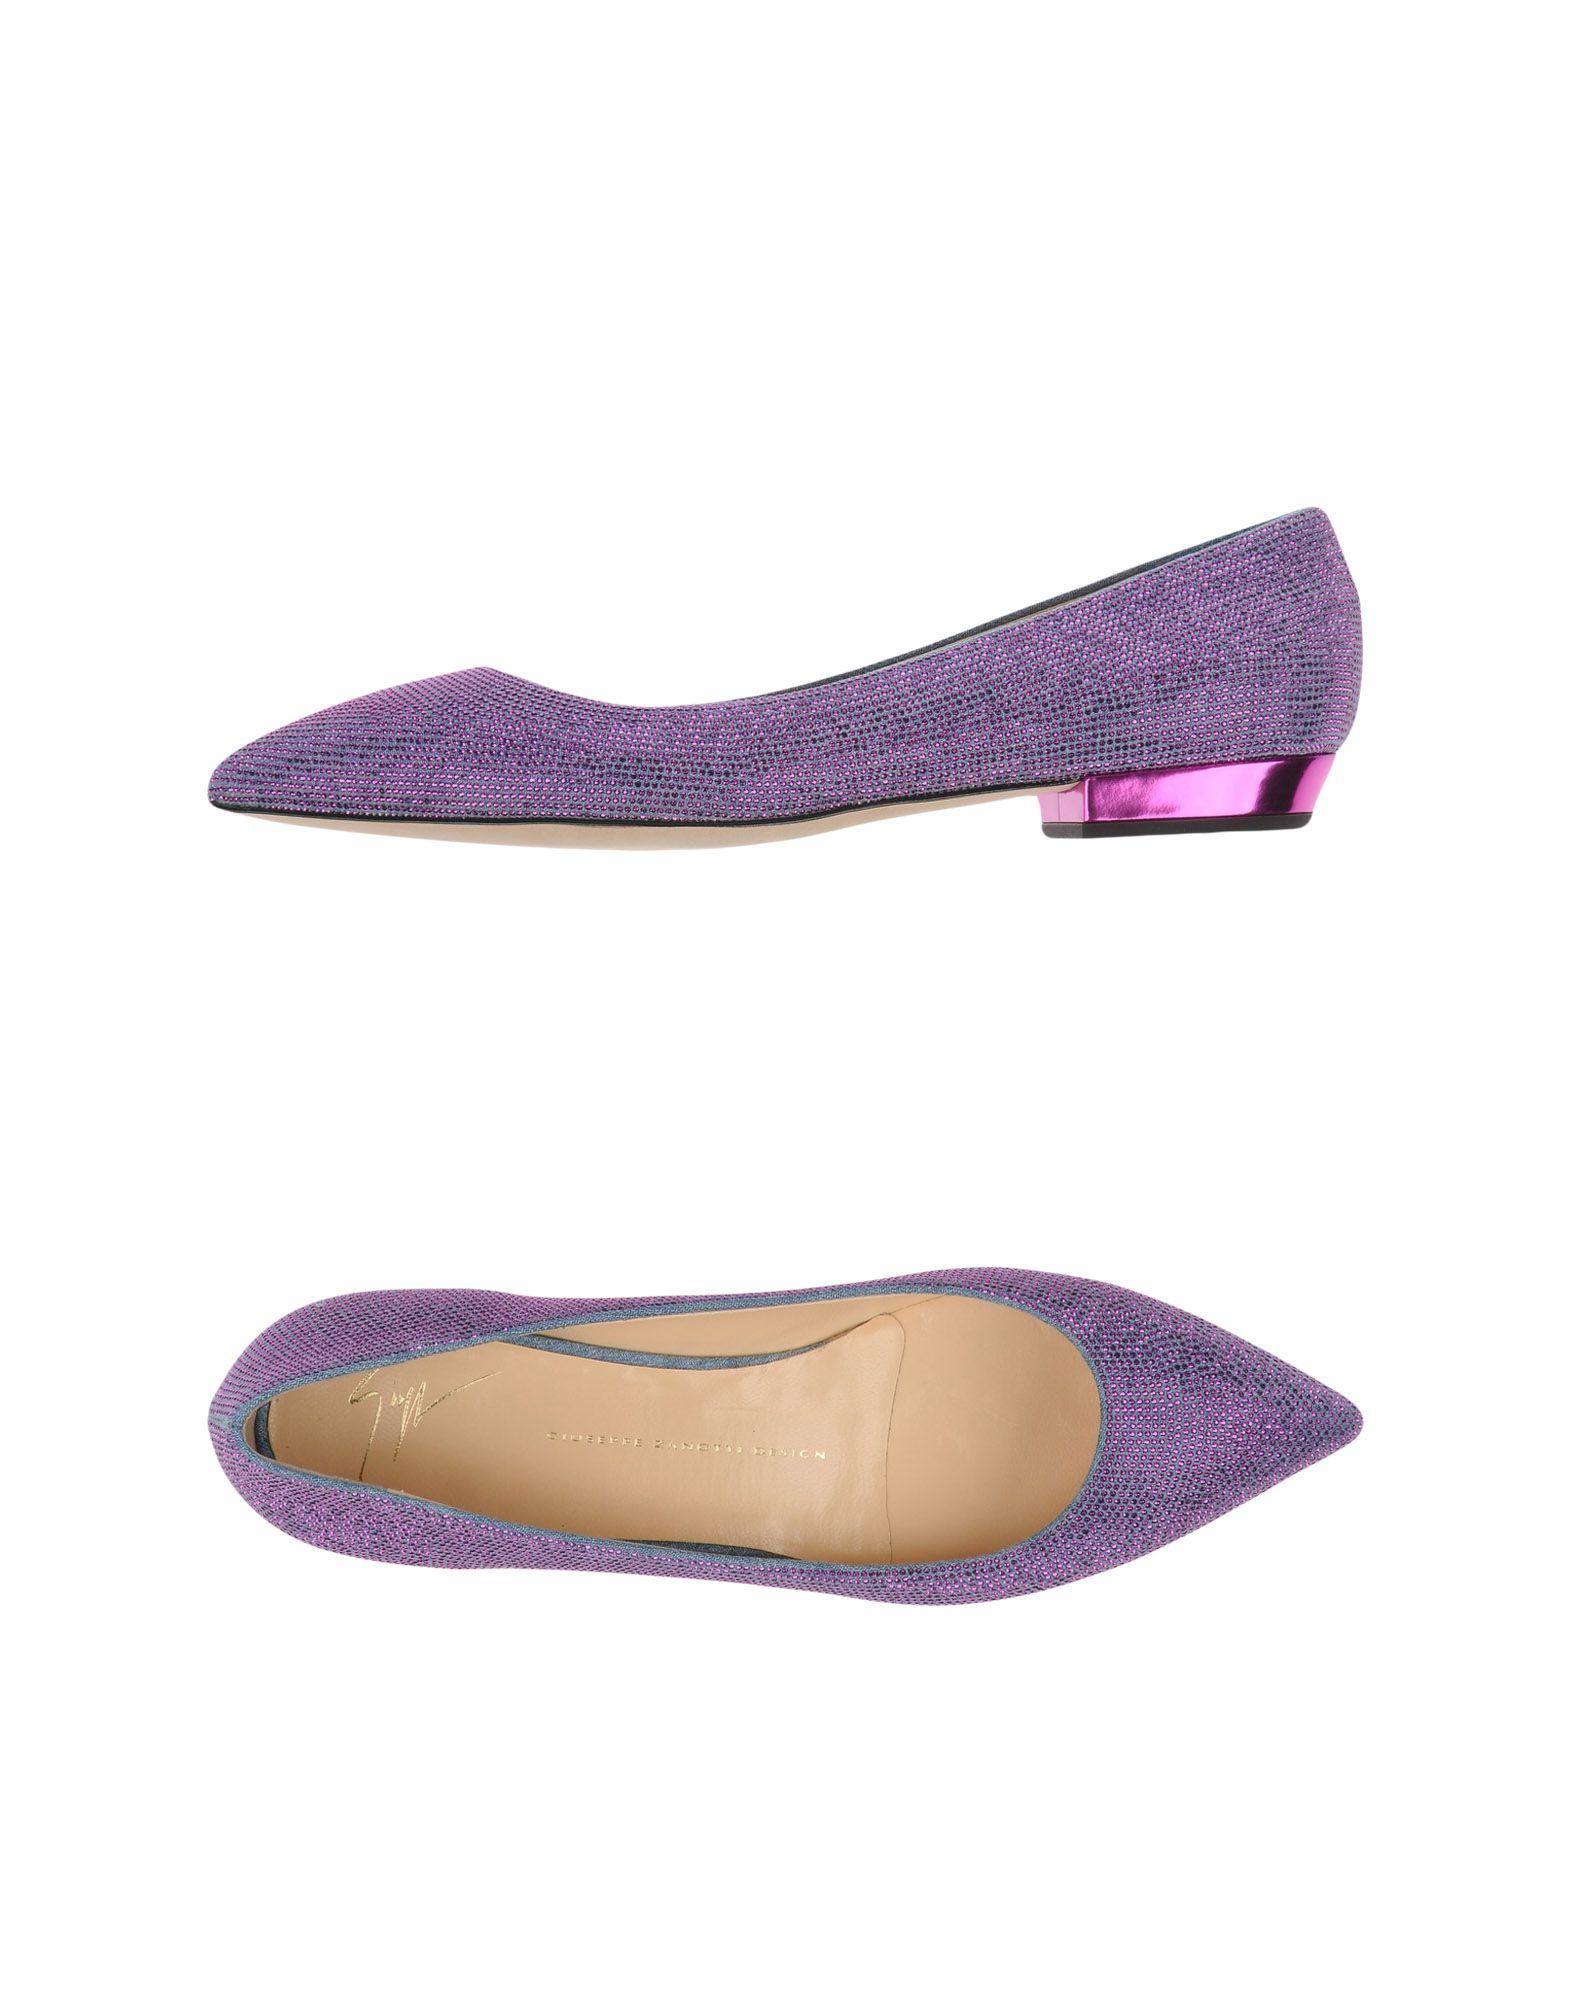 Giuseppe Zanotti Ballet Flats In Purple | Lyst